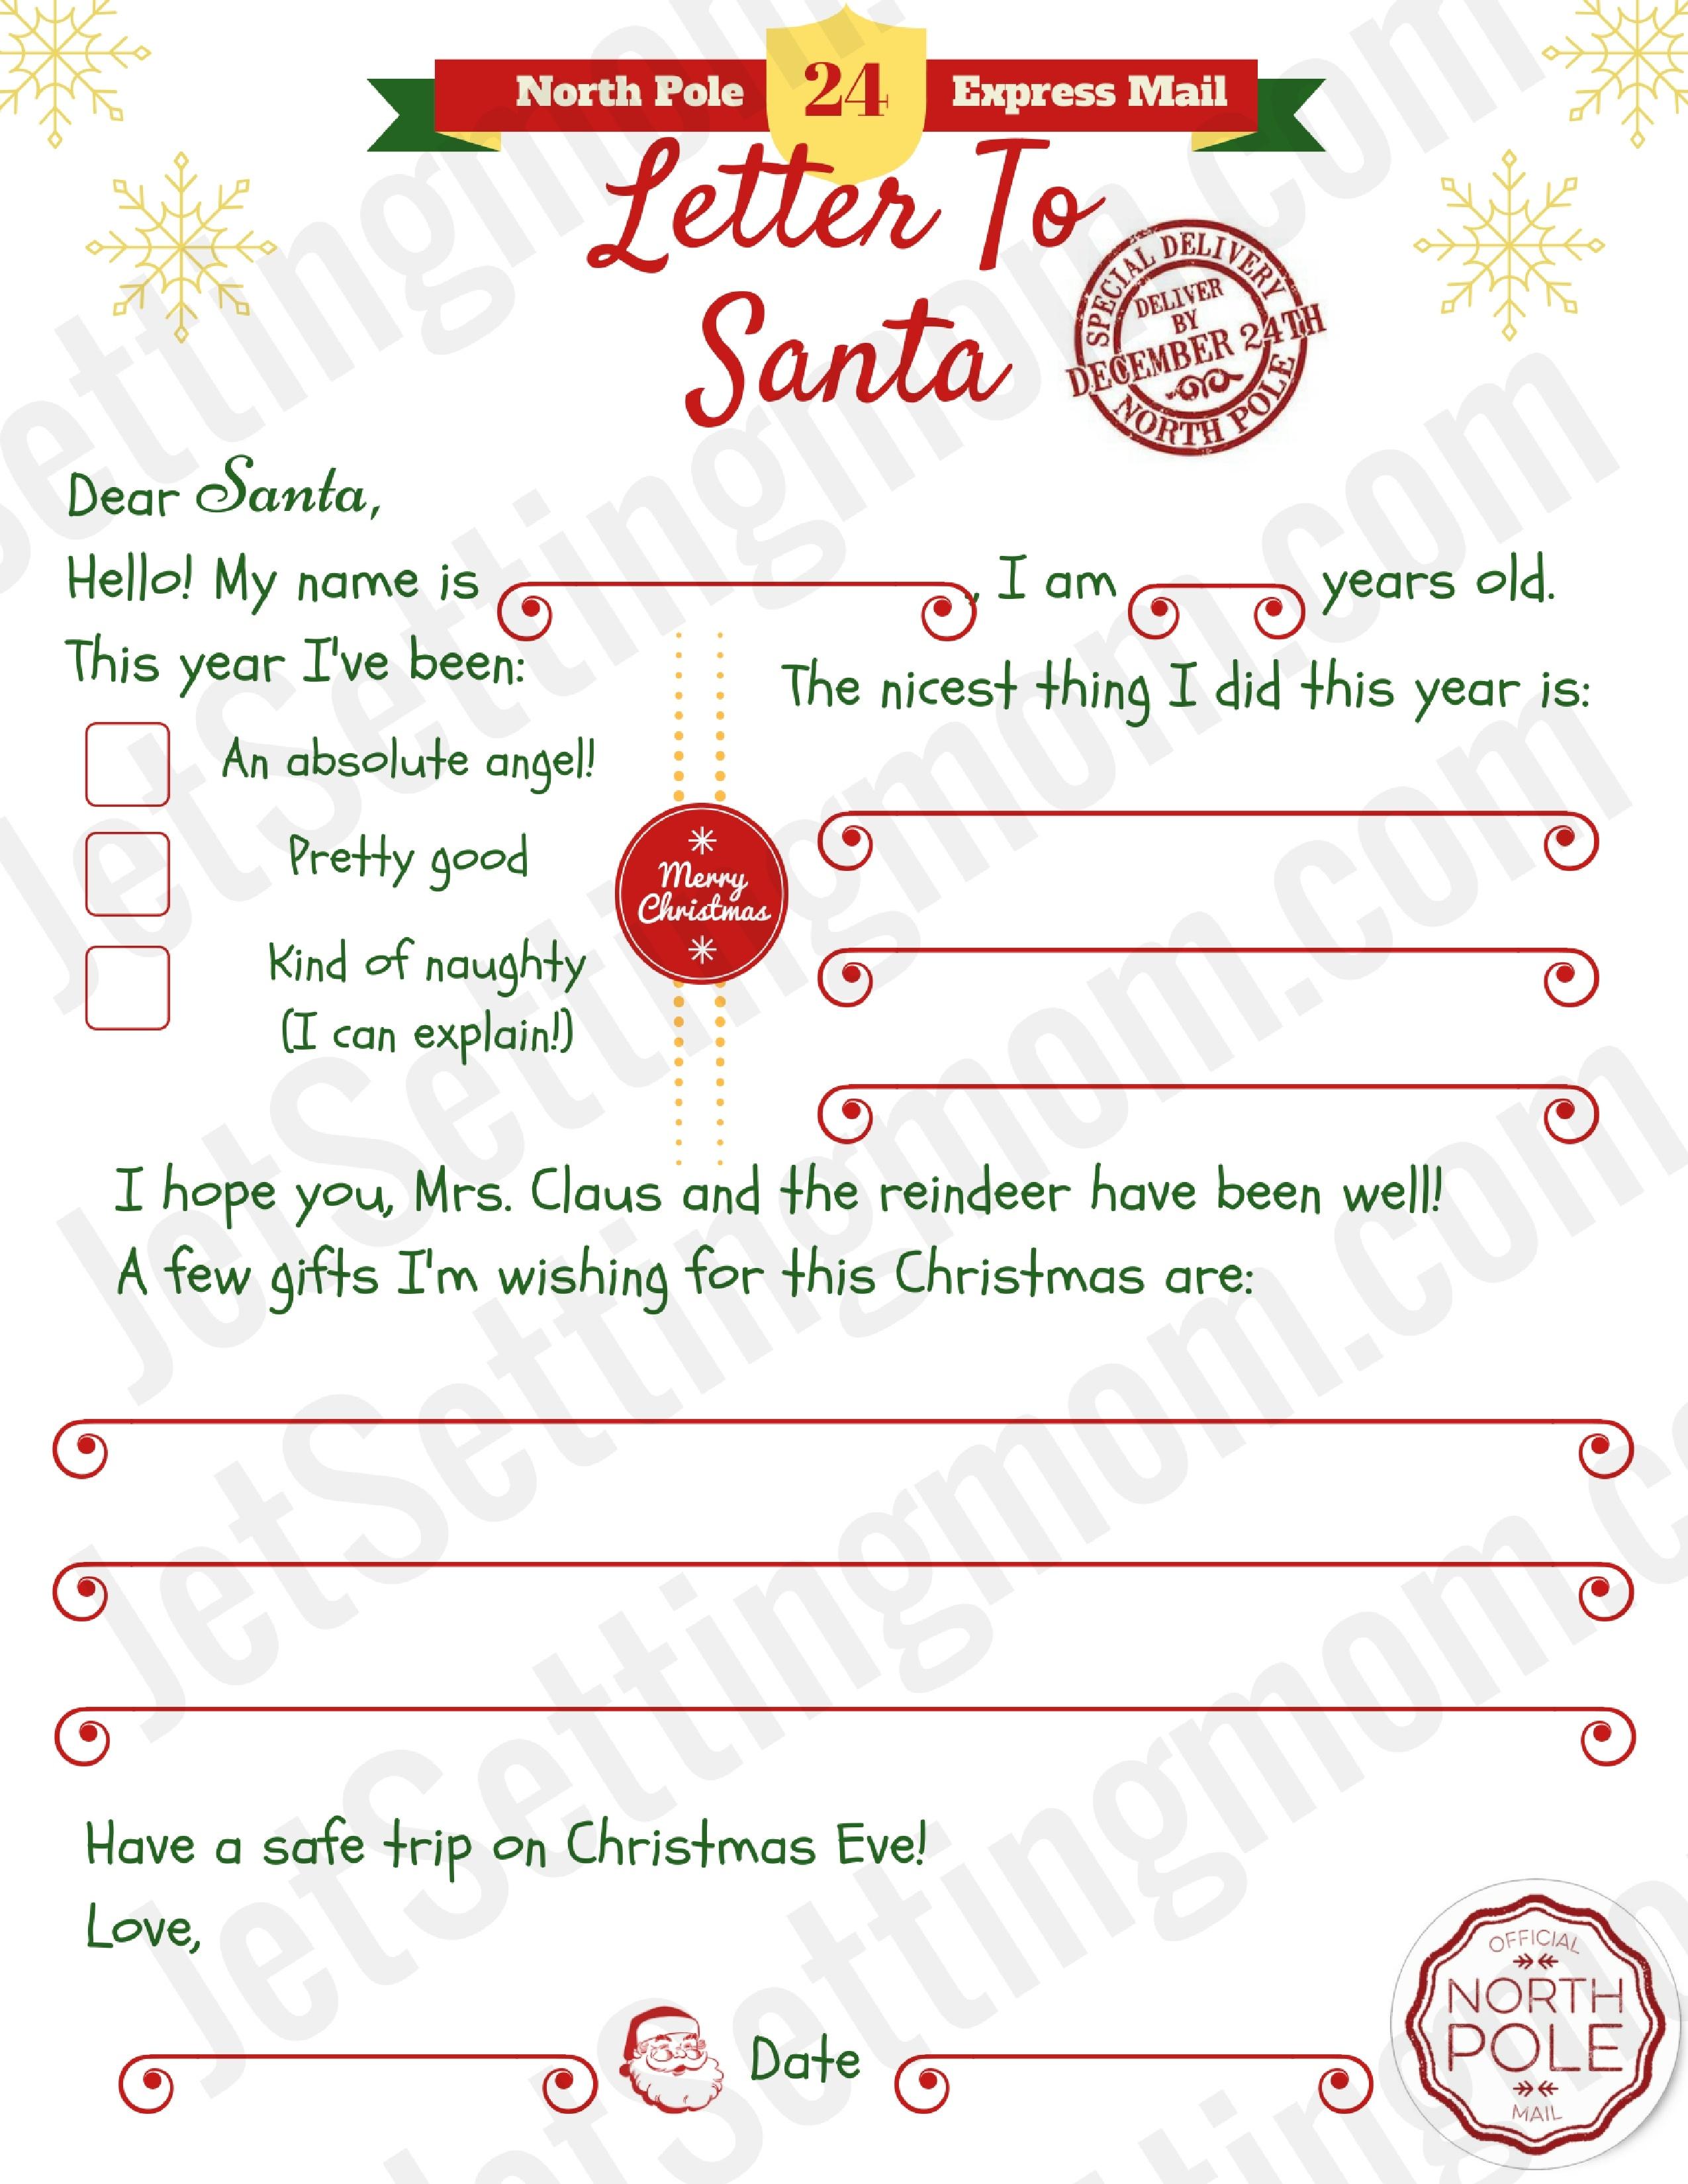 Free Printable Letter To Santa Template - Writing To Santa Made Easy! - Letter To Santa Template Free Printable